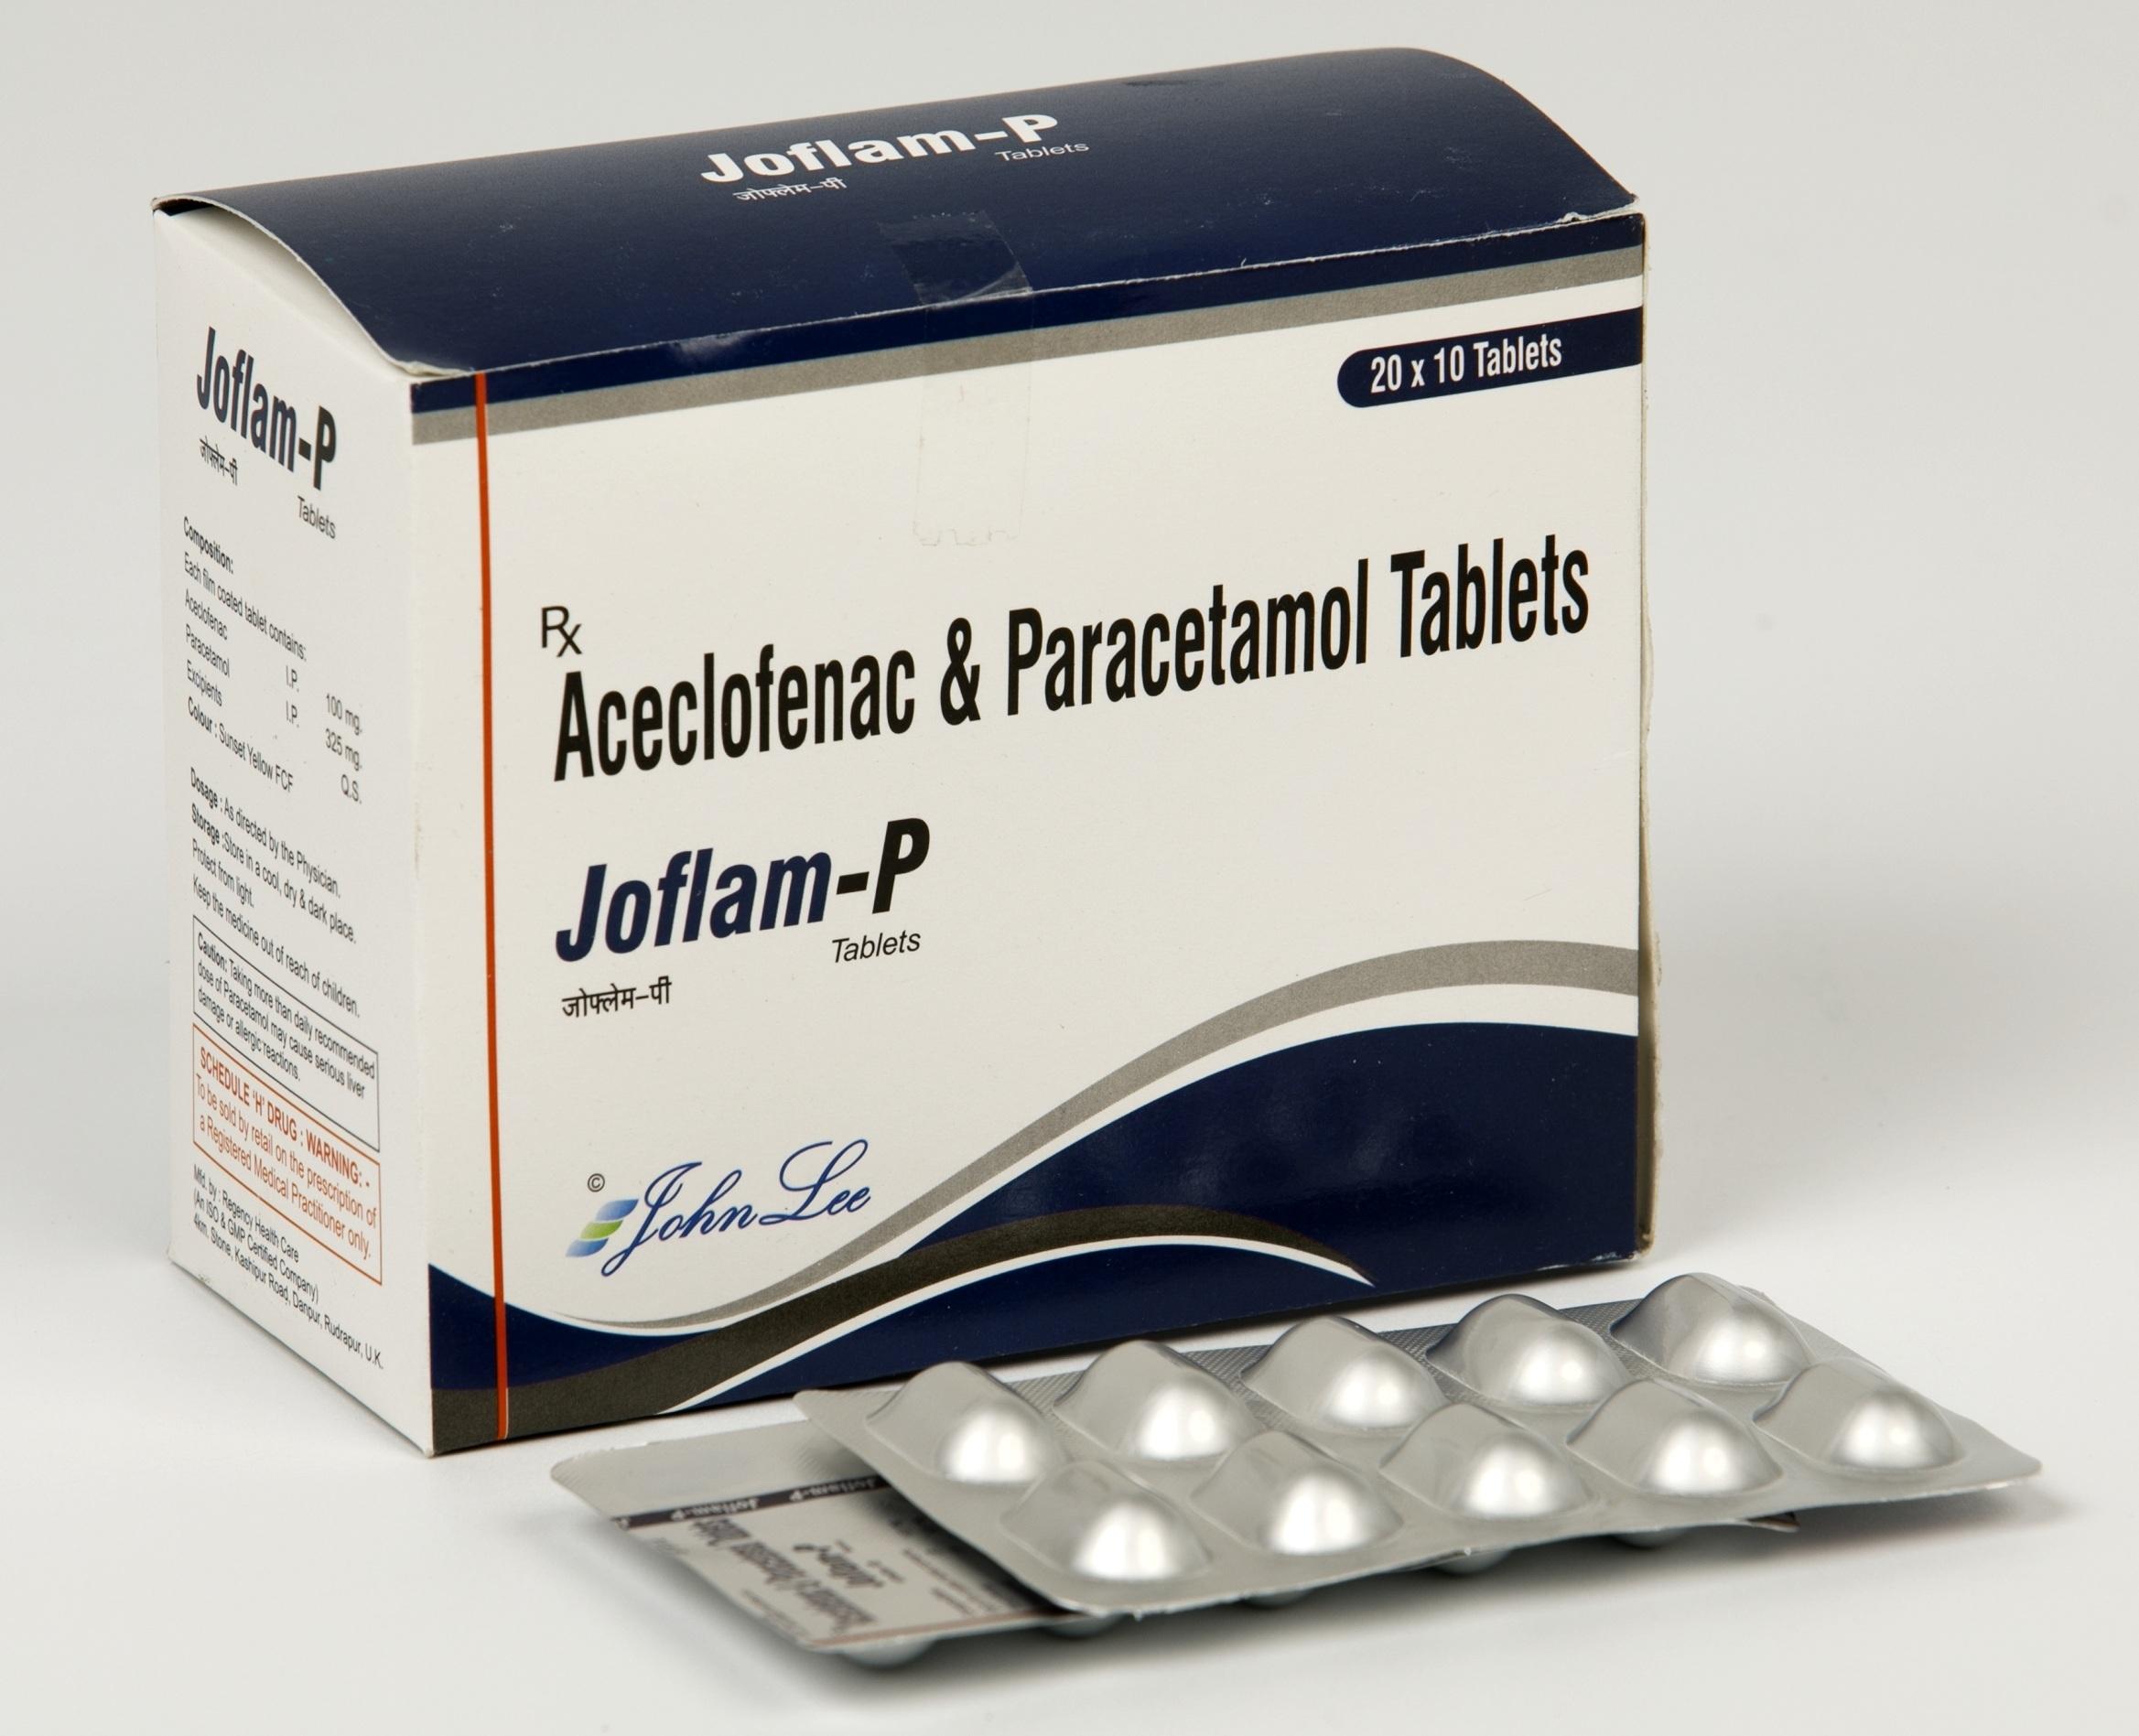 Aceclofenac IP 100MG + Paracetamol IP 325MG